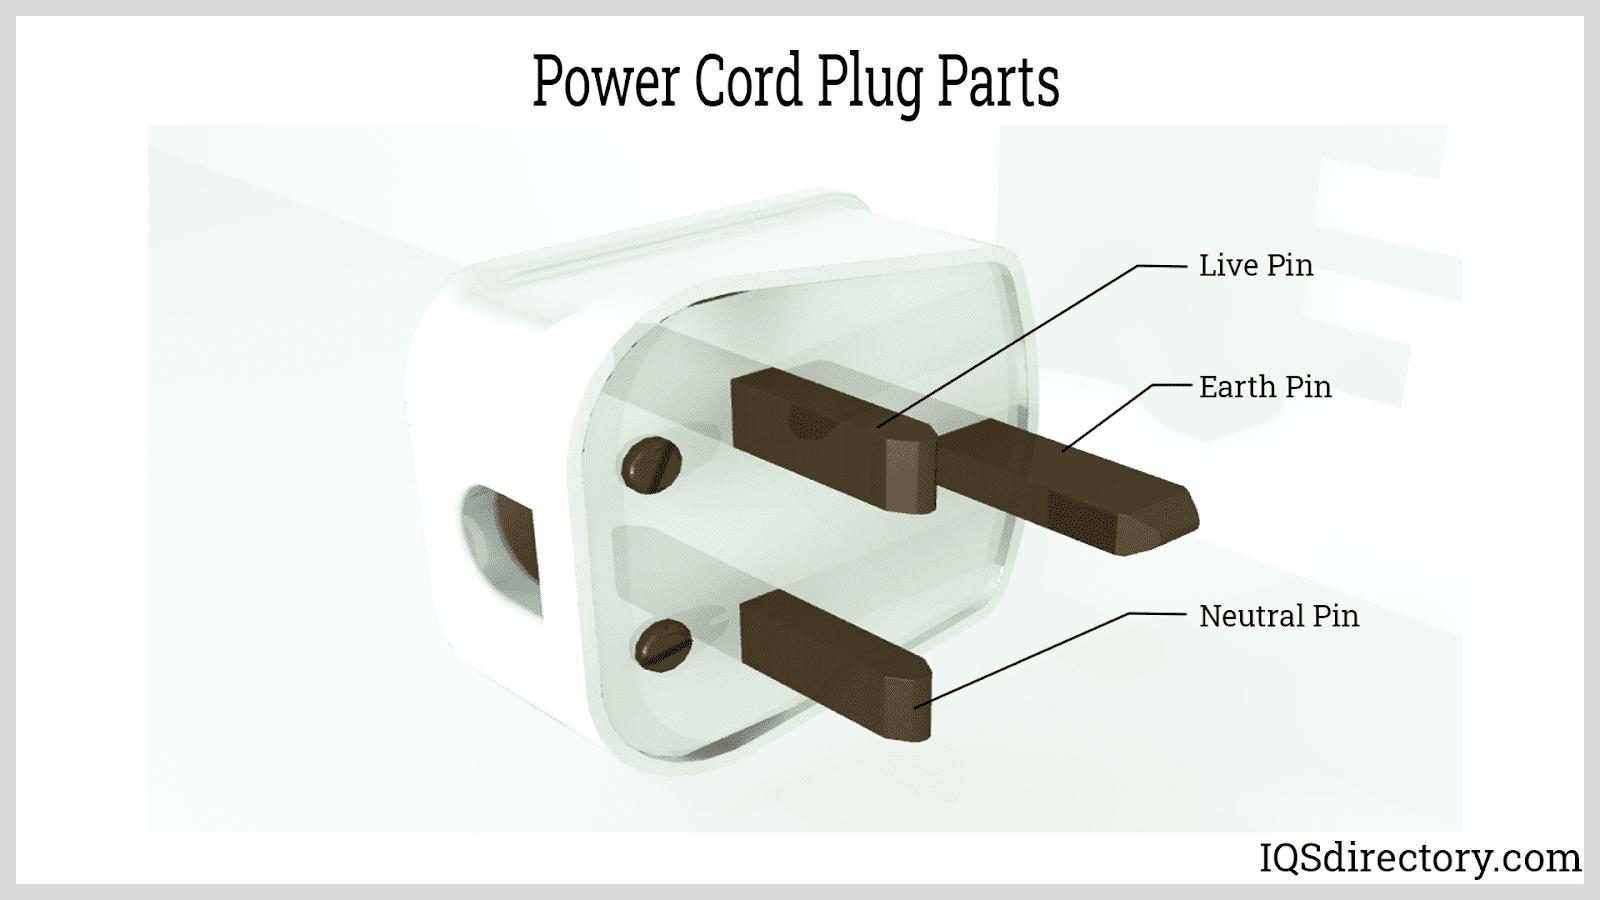 Power Cord Plug Parts